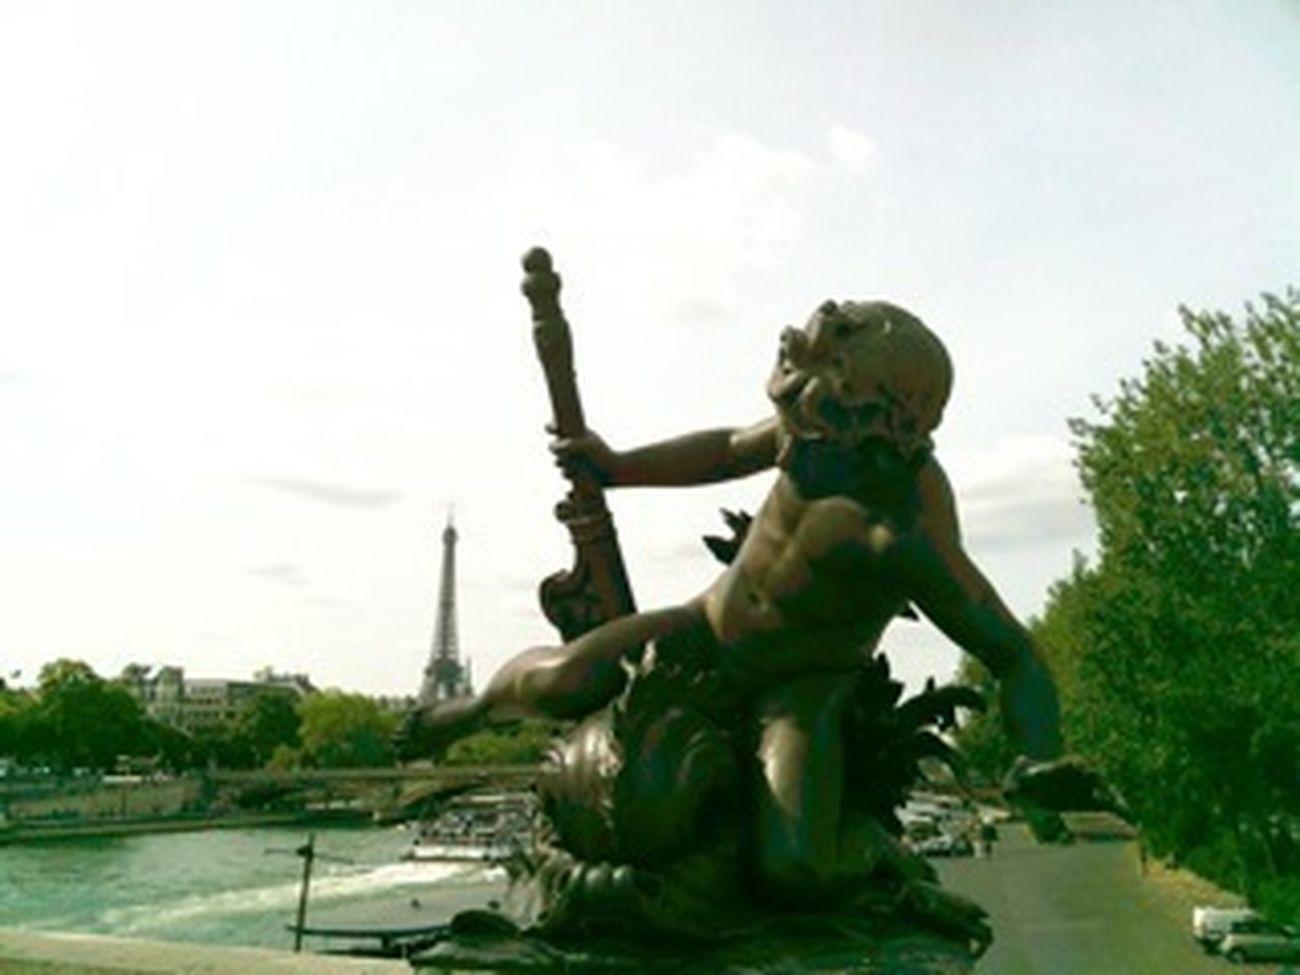 GetYourGuide Cityscapes Paris Grandpalais